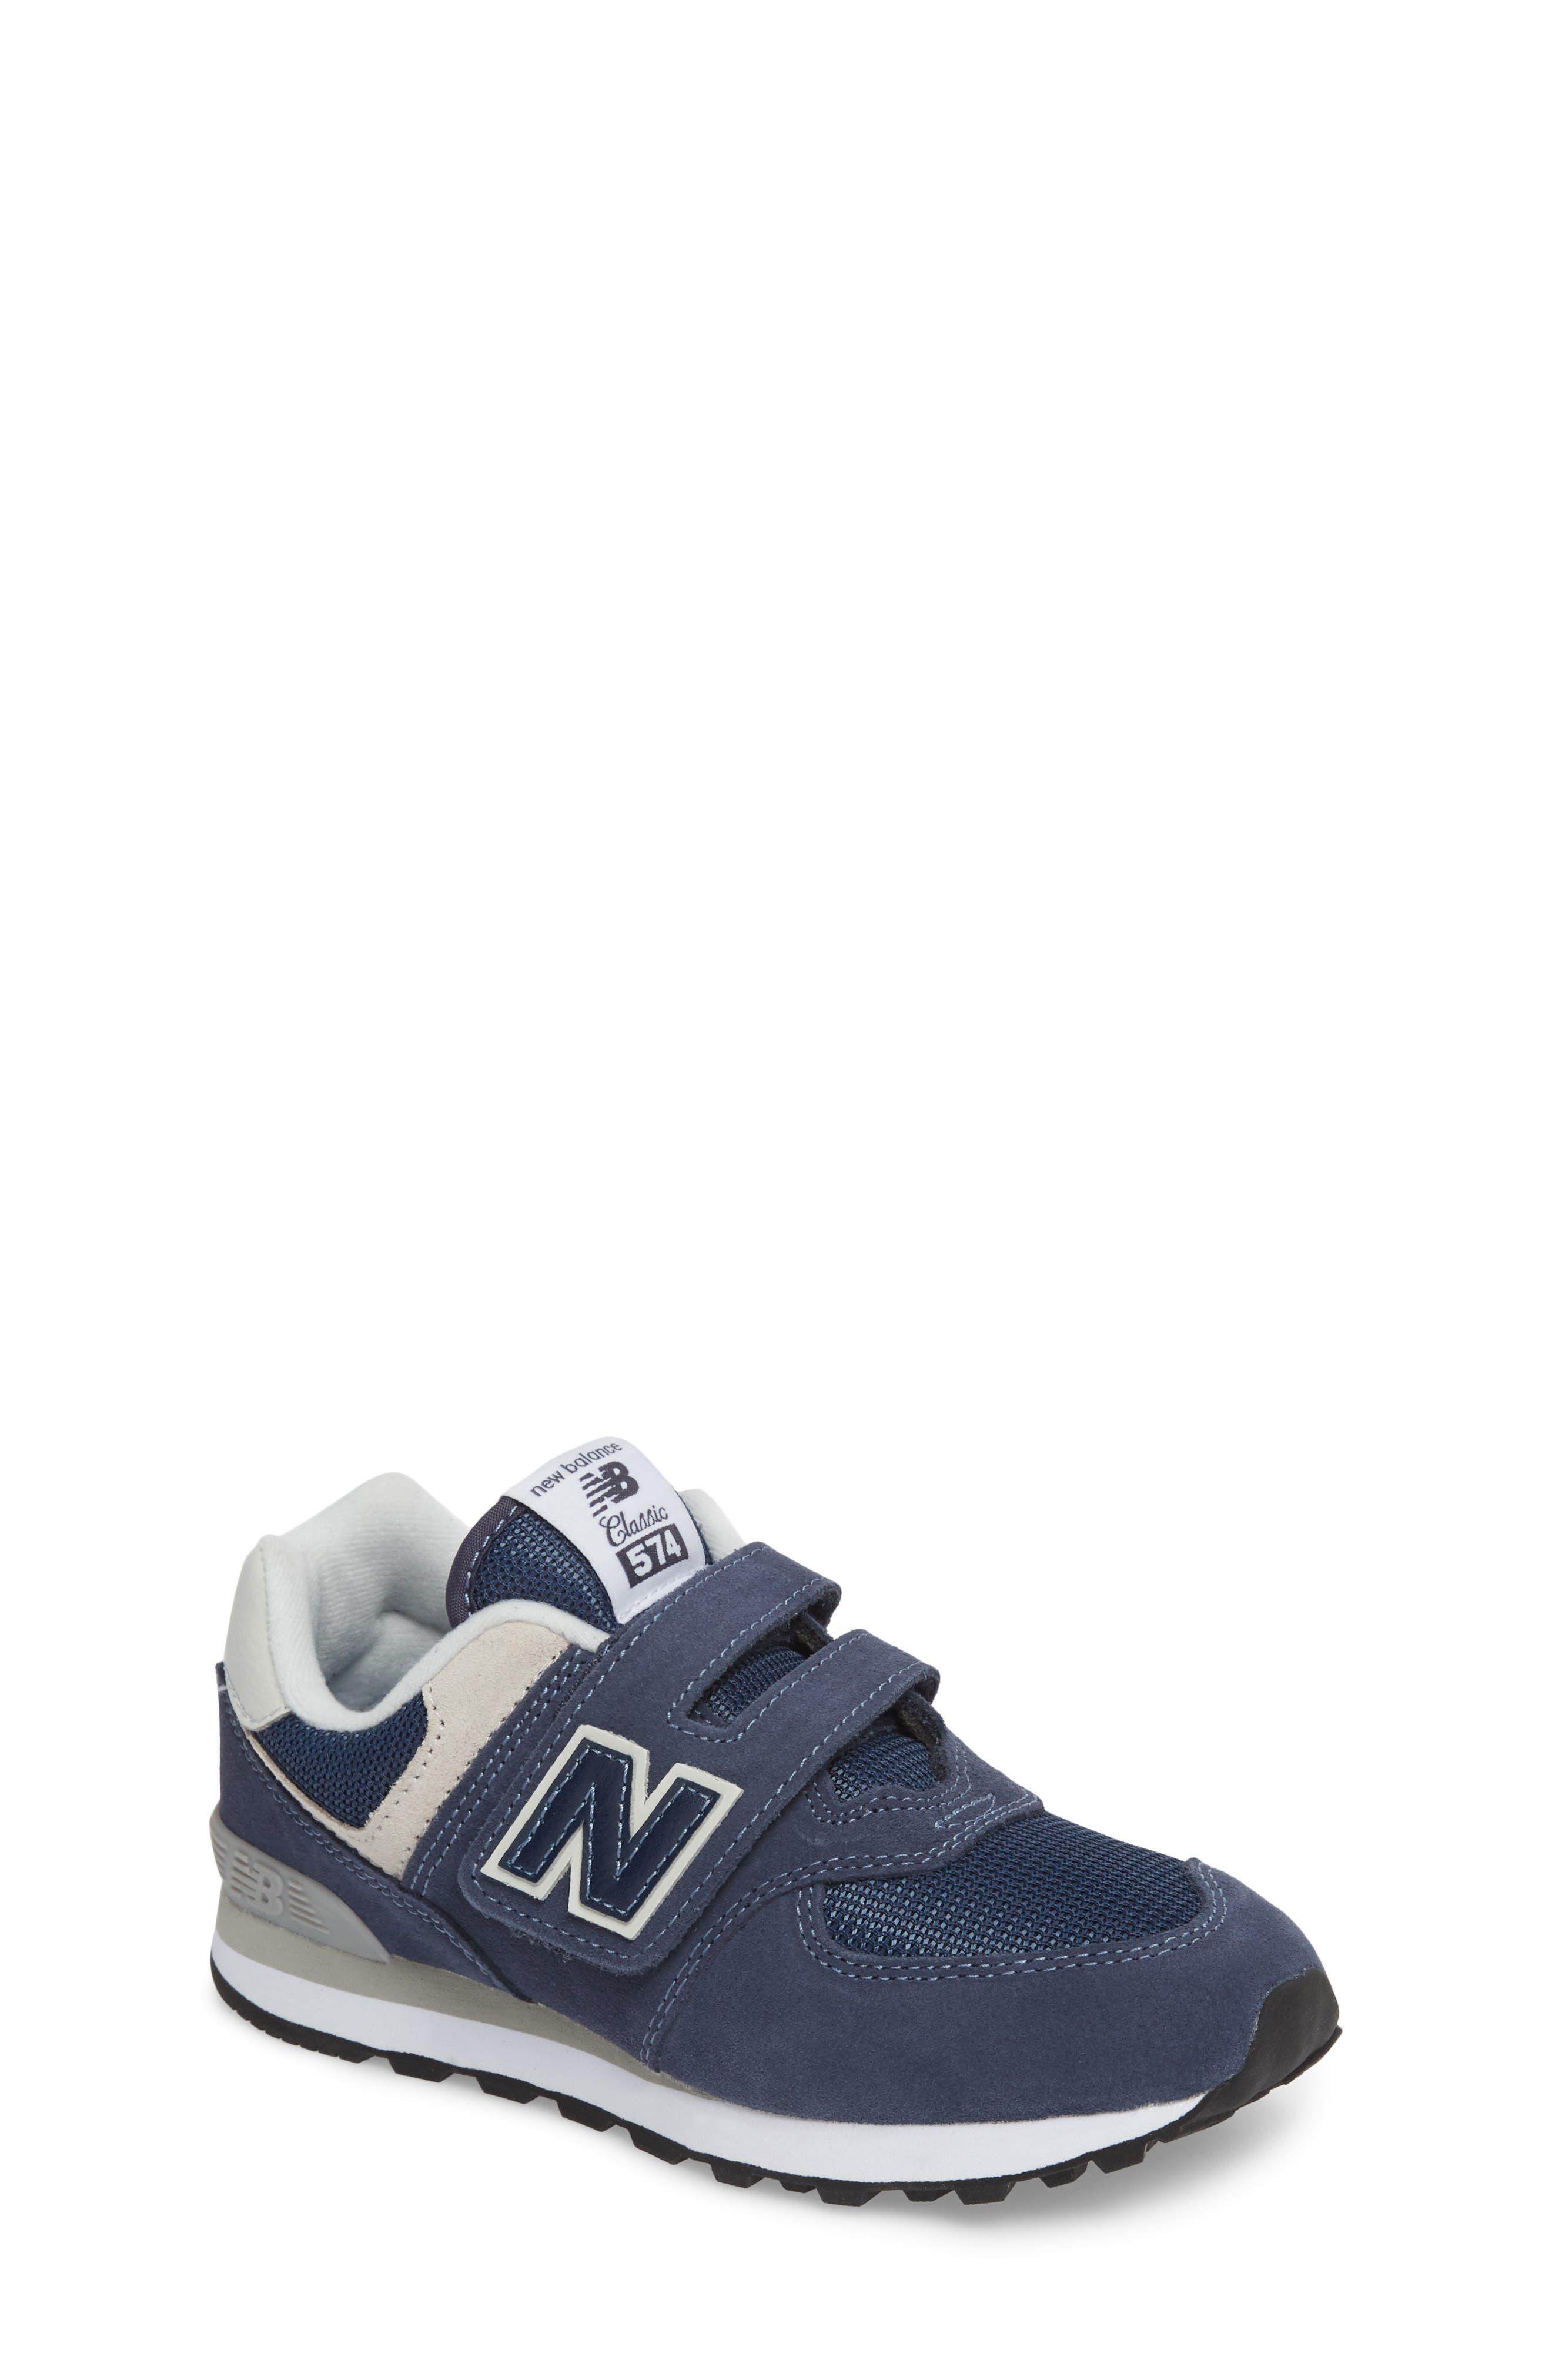 574 Retro Surf Sneaker,                             Main thumbnail 1, color,                             Navy